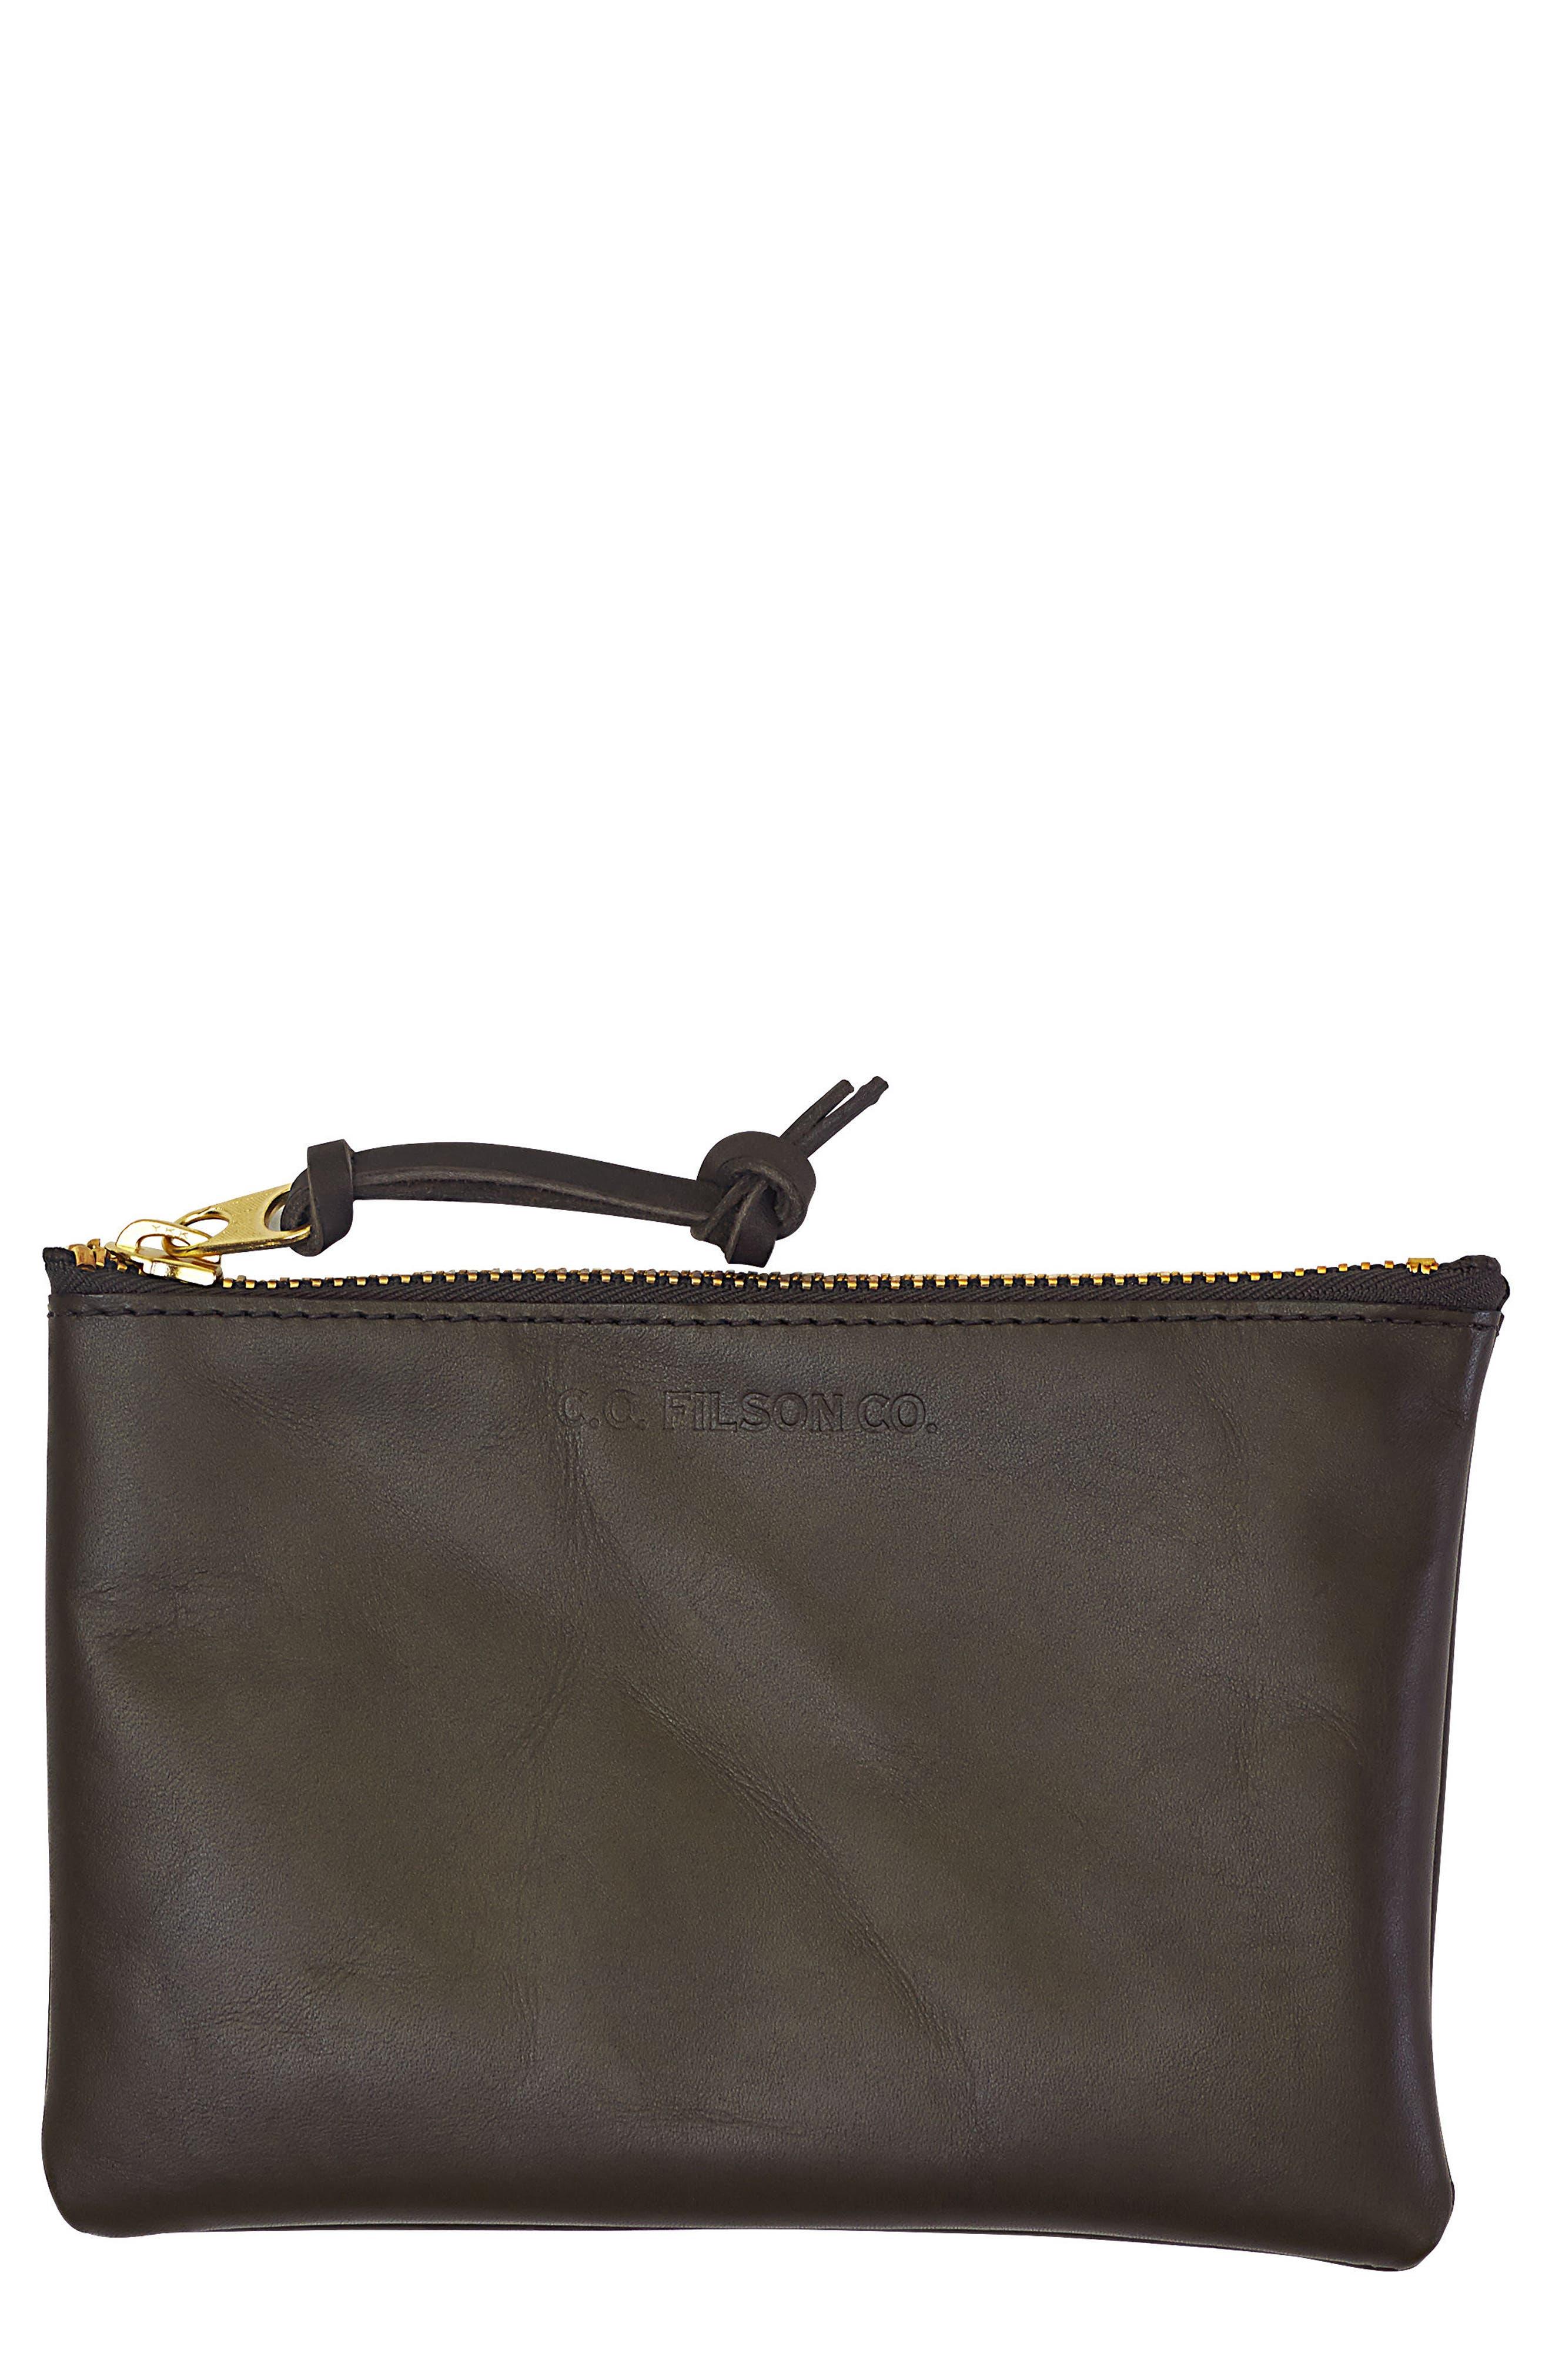 Medium Leather Zipper Pouch,                             Main thumbnail 1, color,                             Moss